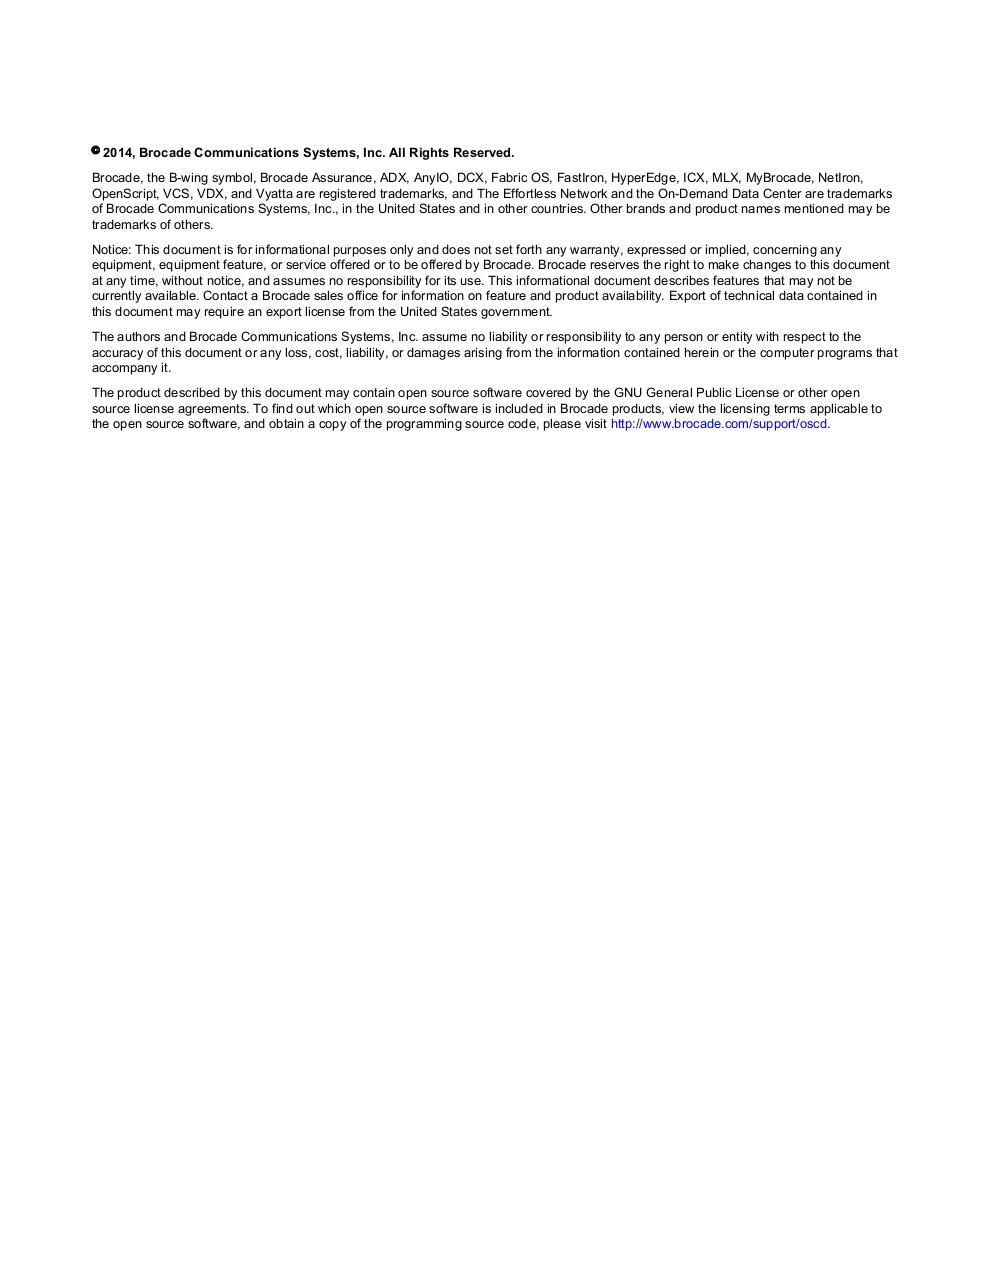 FastIron Ethernet Switch - FastIron_08010_AdminGuide pdf - Fichier PDF